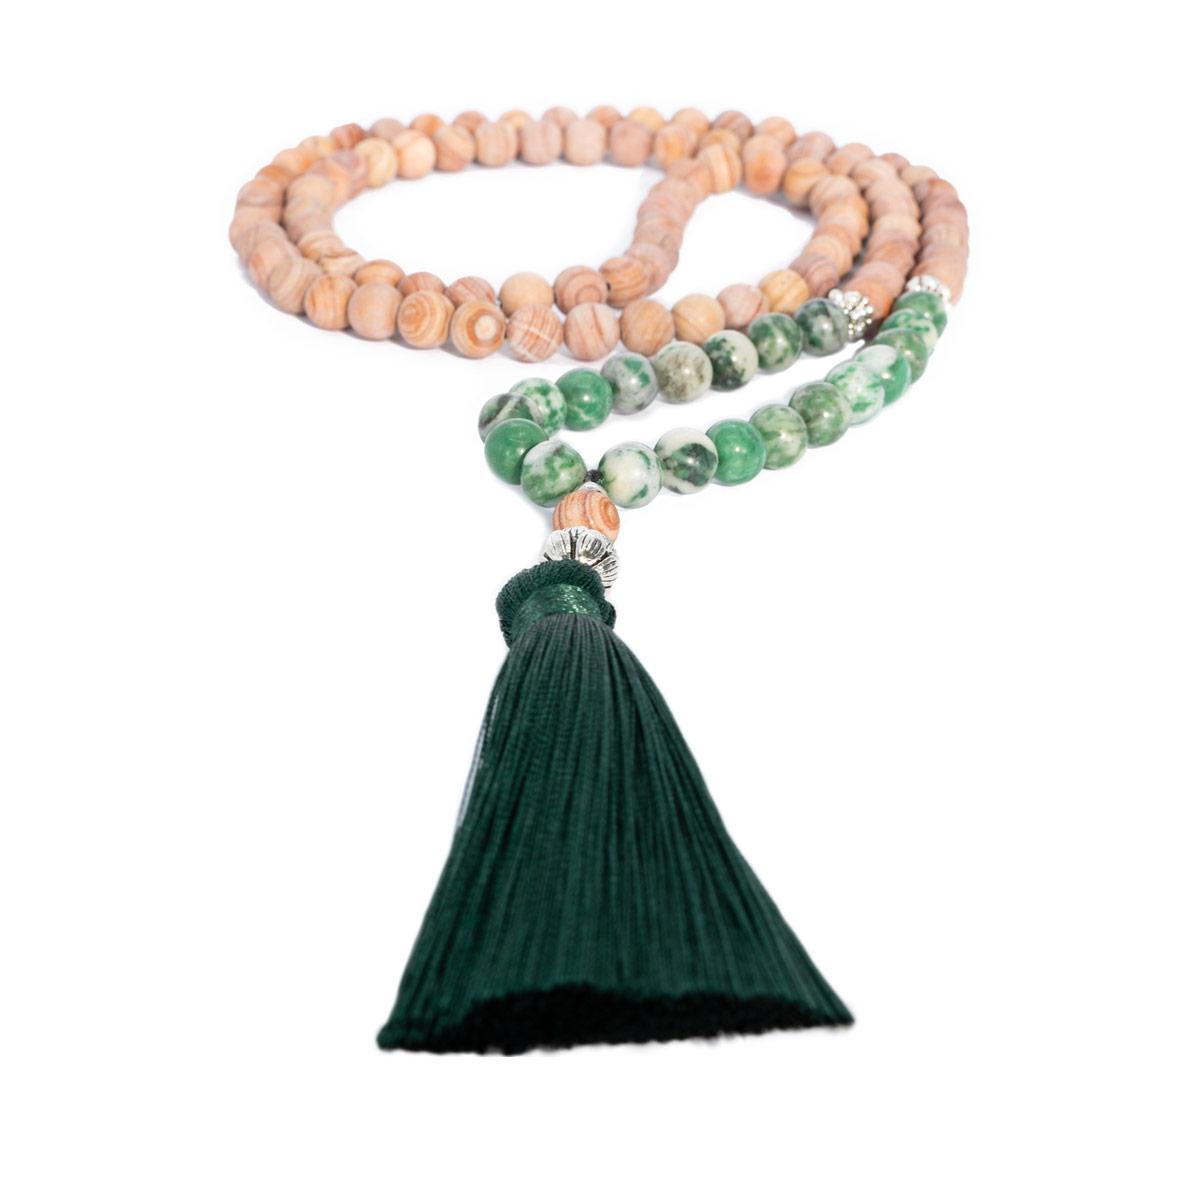 Sri Avinash Blessed™ Qinghai Jadeite & Line Stone Mala Necklace